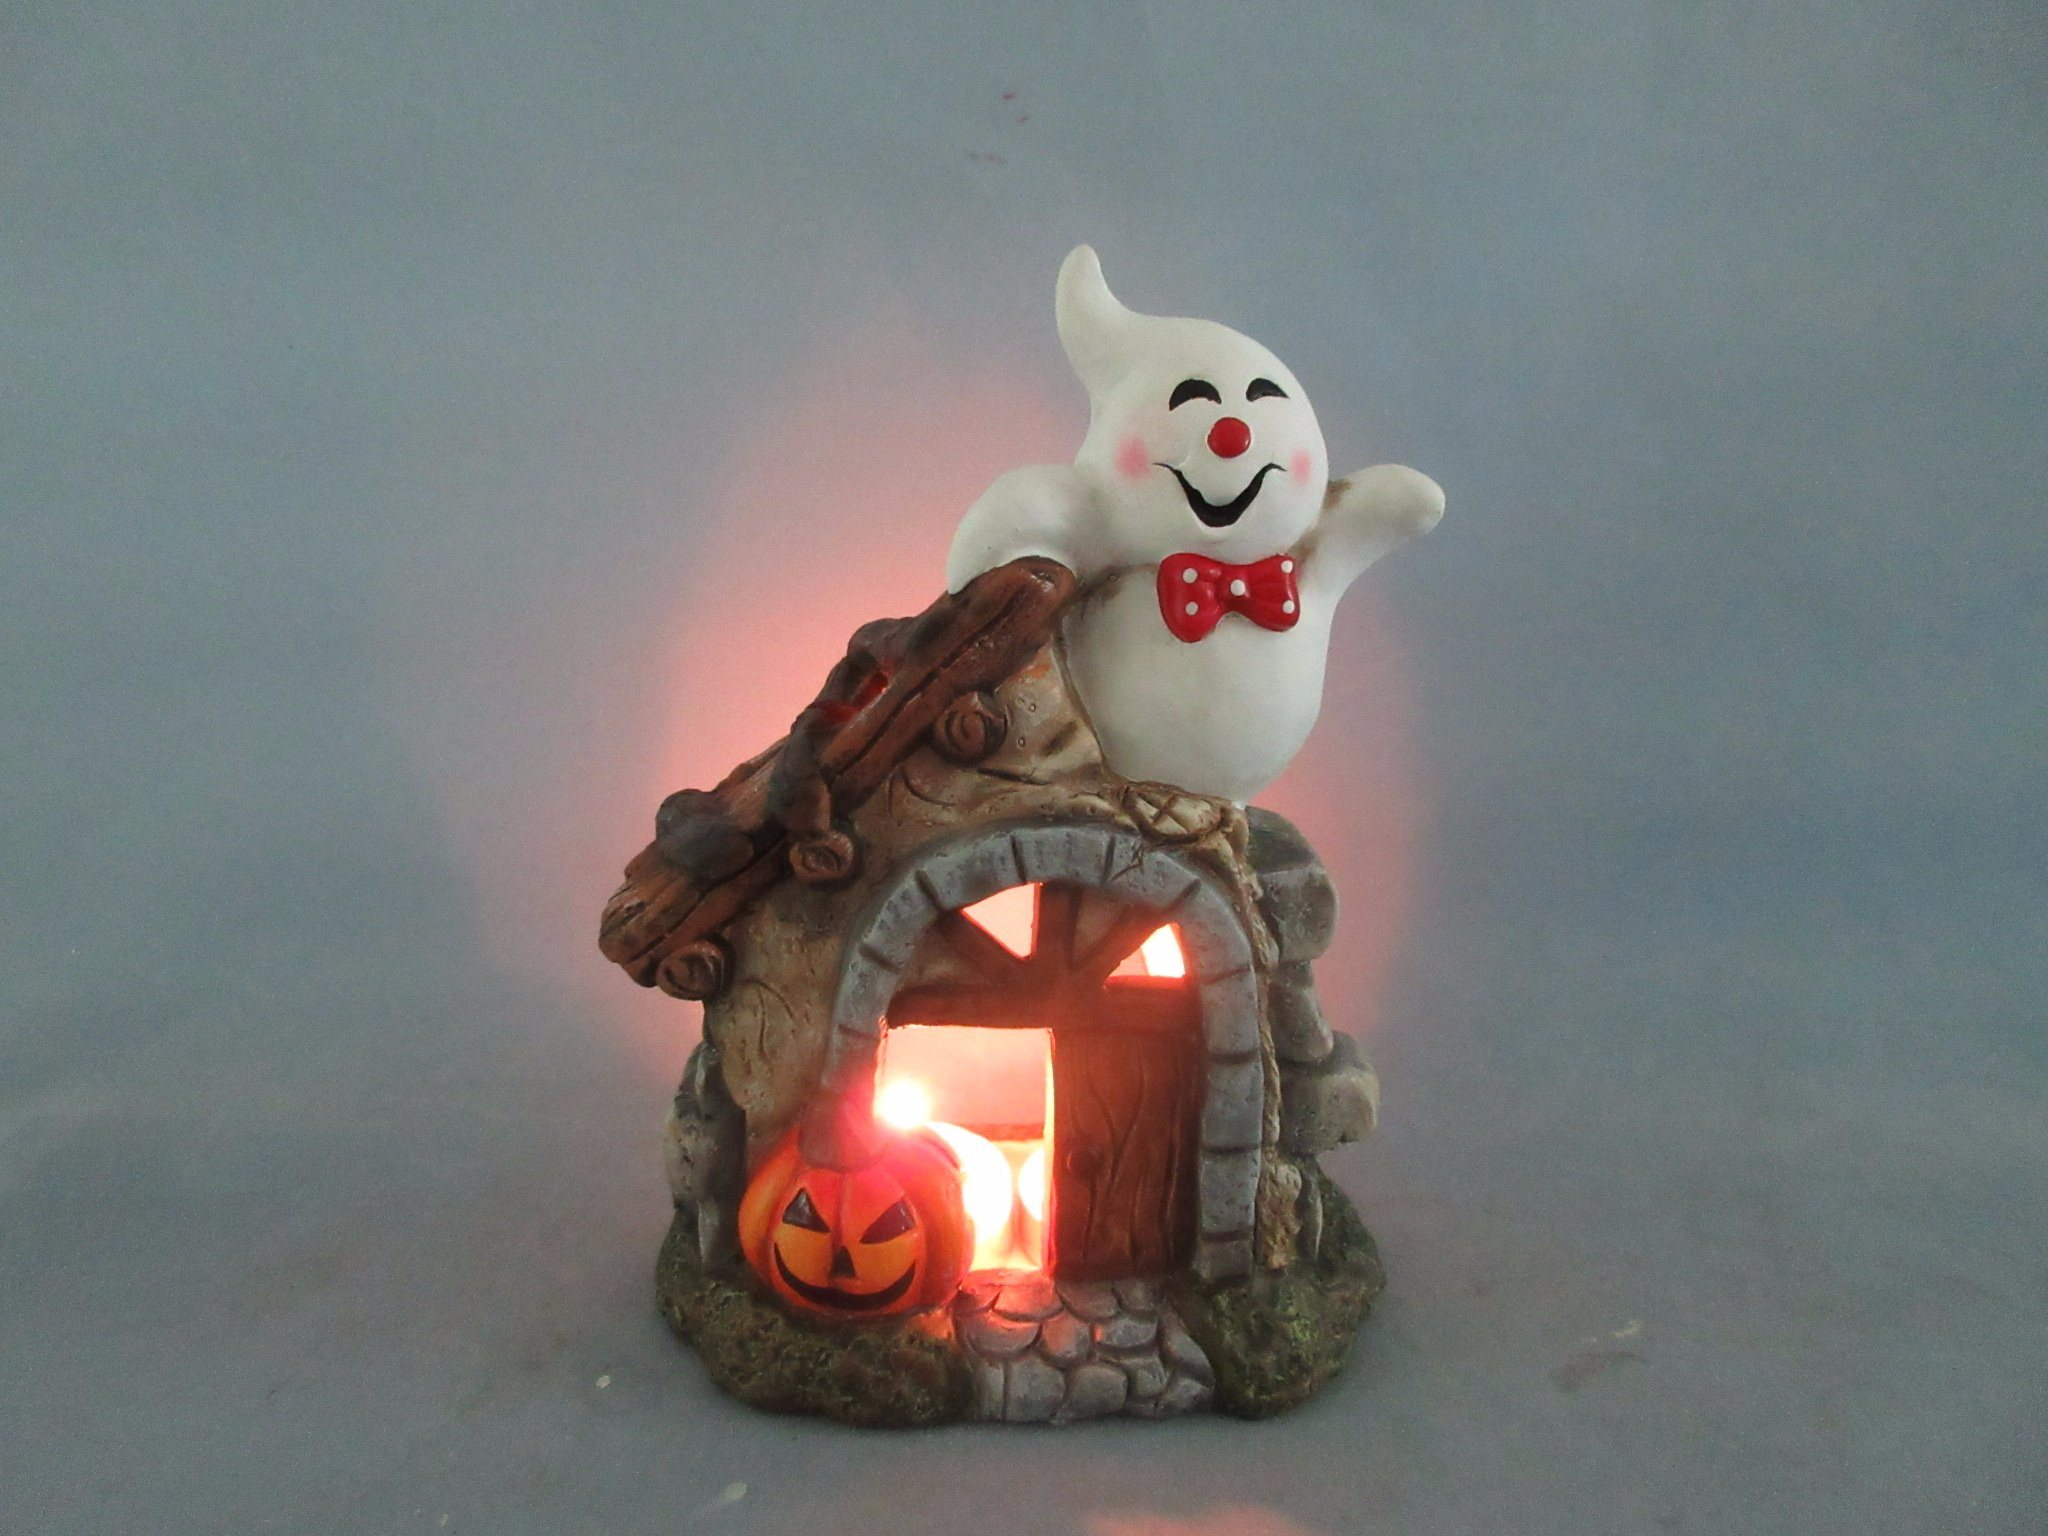 Halloween Pumpkin Ceramic Arts and Crafts (LOE2683-18z)